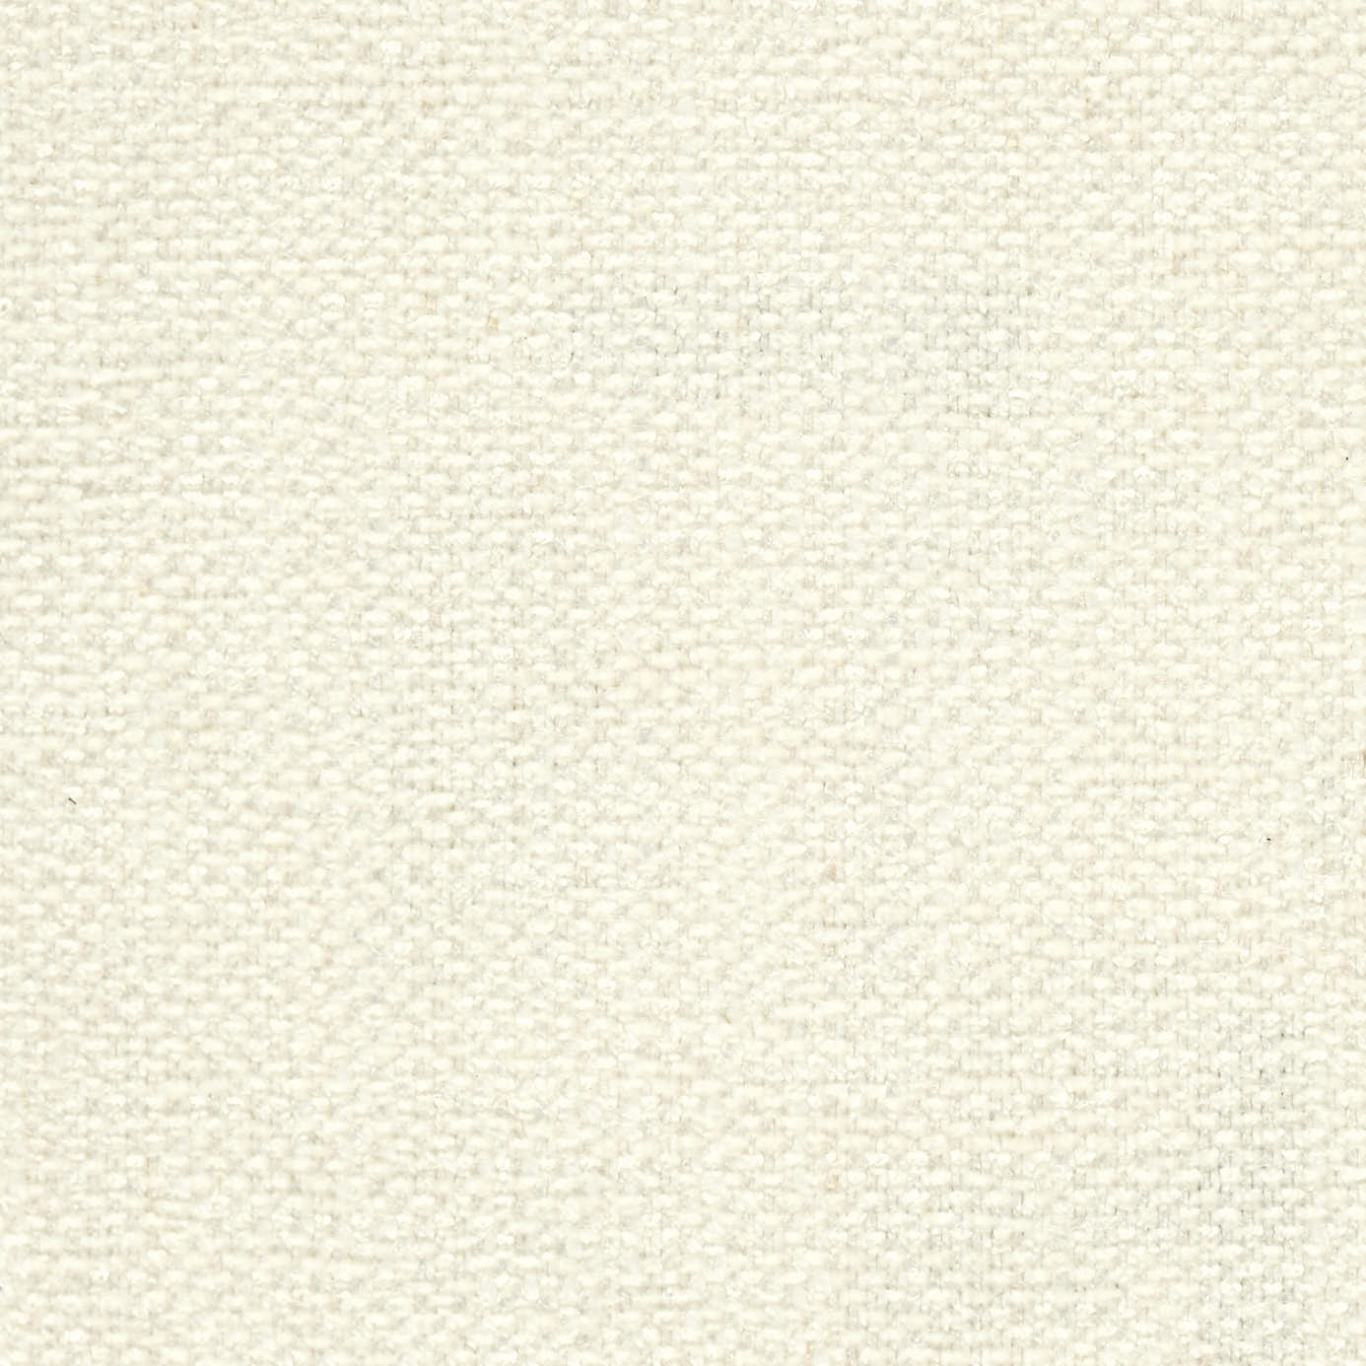 Image of Harlequin Molecule Coconut Fabric 440304